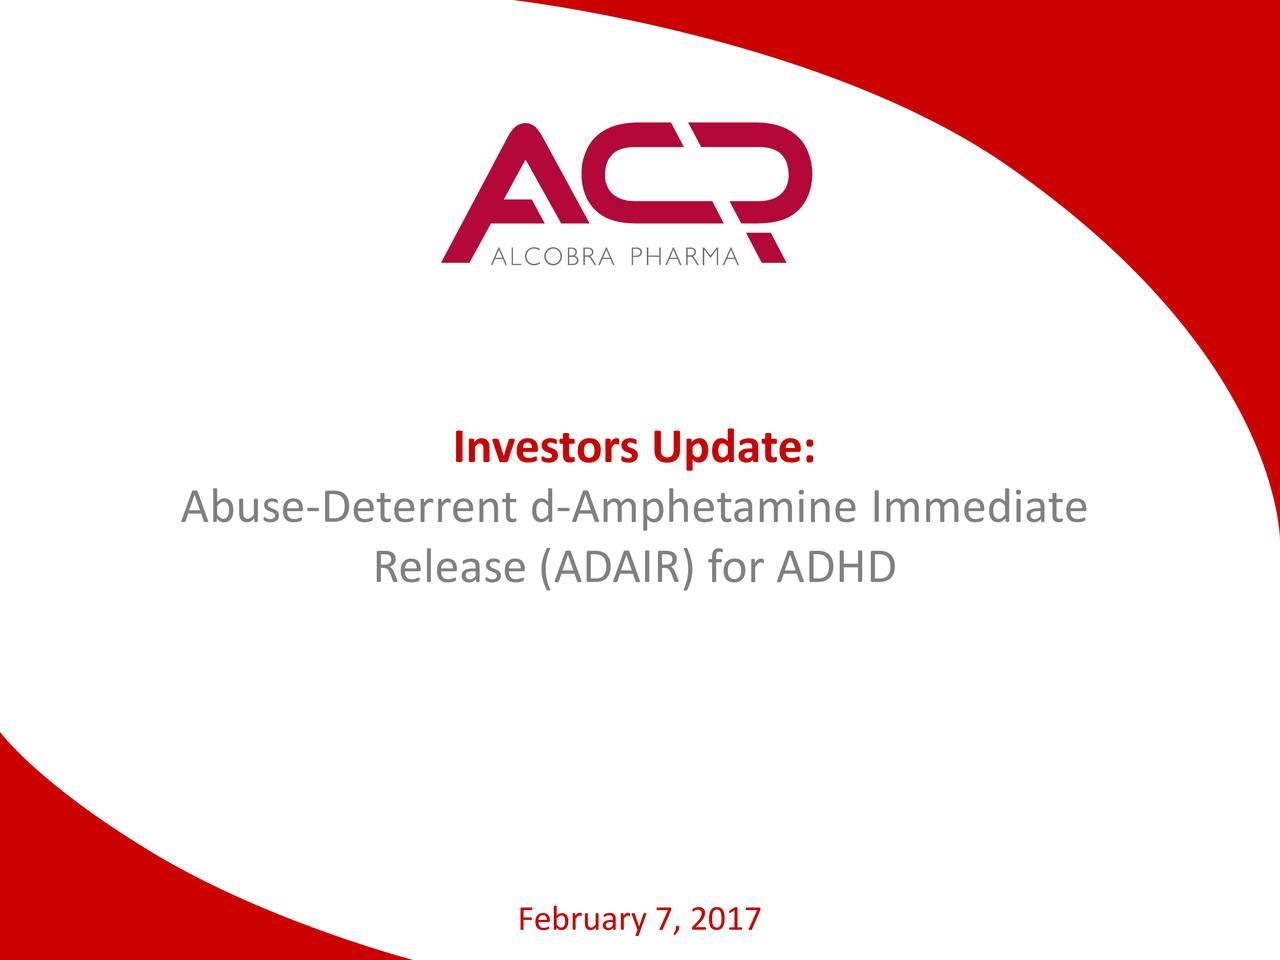 Abuse-Deterrent d-Amphetamine Immediate Release (ADAIR) for ADHD February 7, 2017